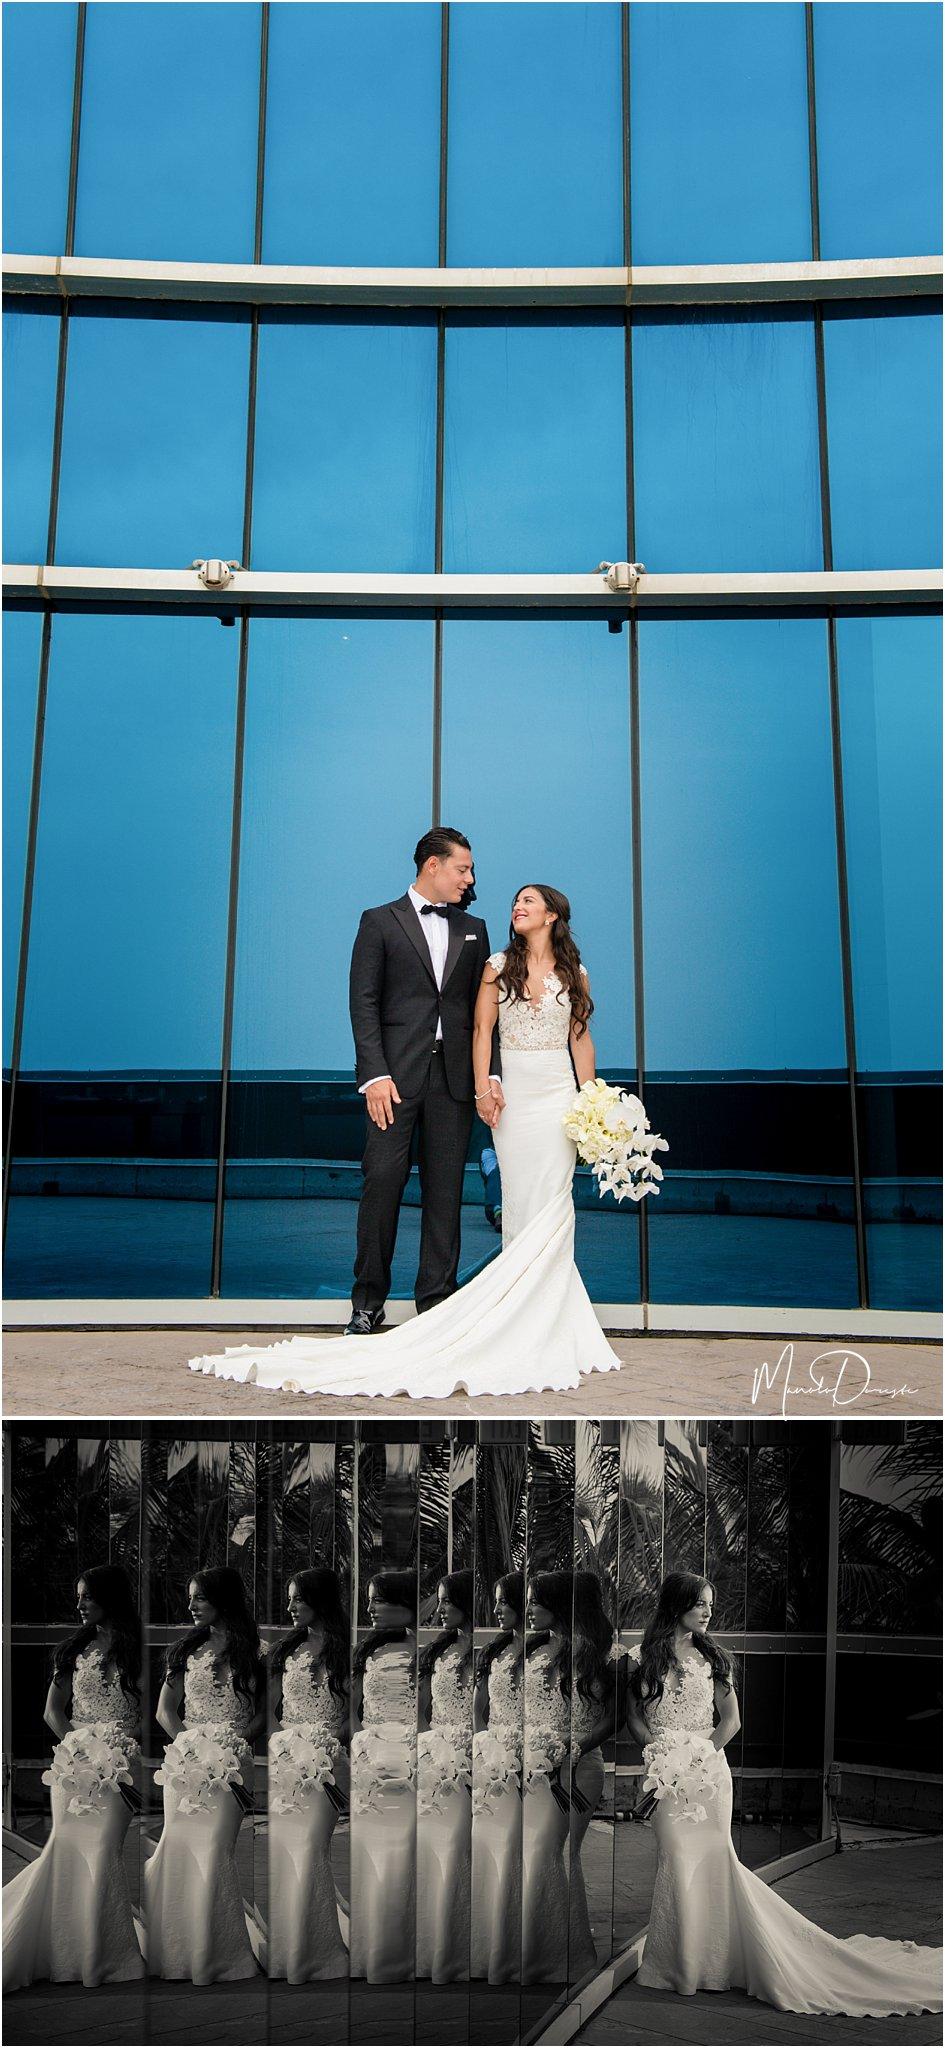 0328_ManoloDoreste_InFocusStudios_Wedding_Family_Photography_Miami_MiamiPhotographer.jpg